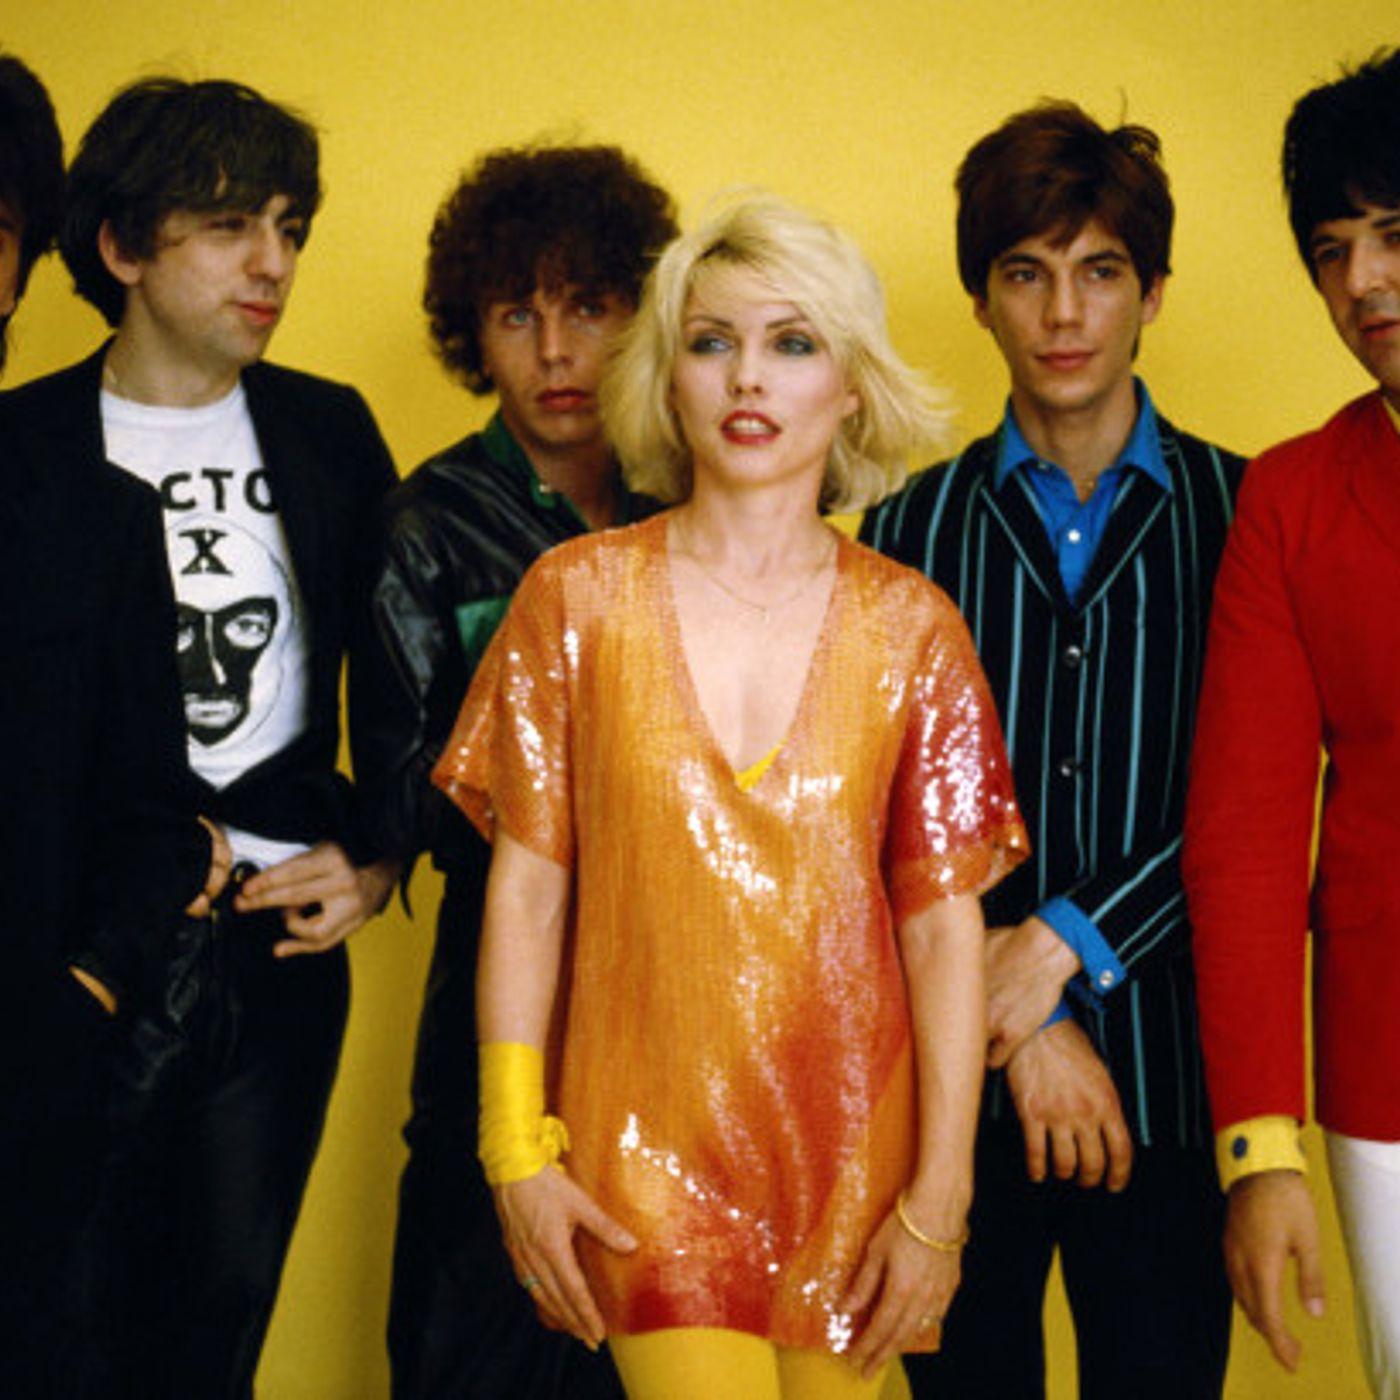 BEST OF CLASSIC ROCK LIVE playlist da classikera #1323 #blondie #jimihendrix #whatif #wearamask #stayhome #Loki #f9 #xbox #LaRemesaMala